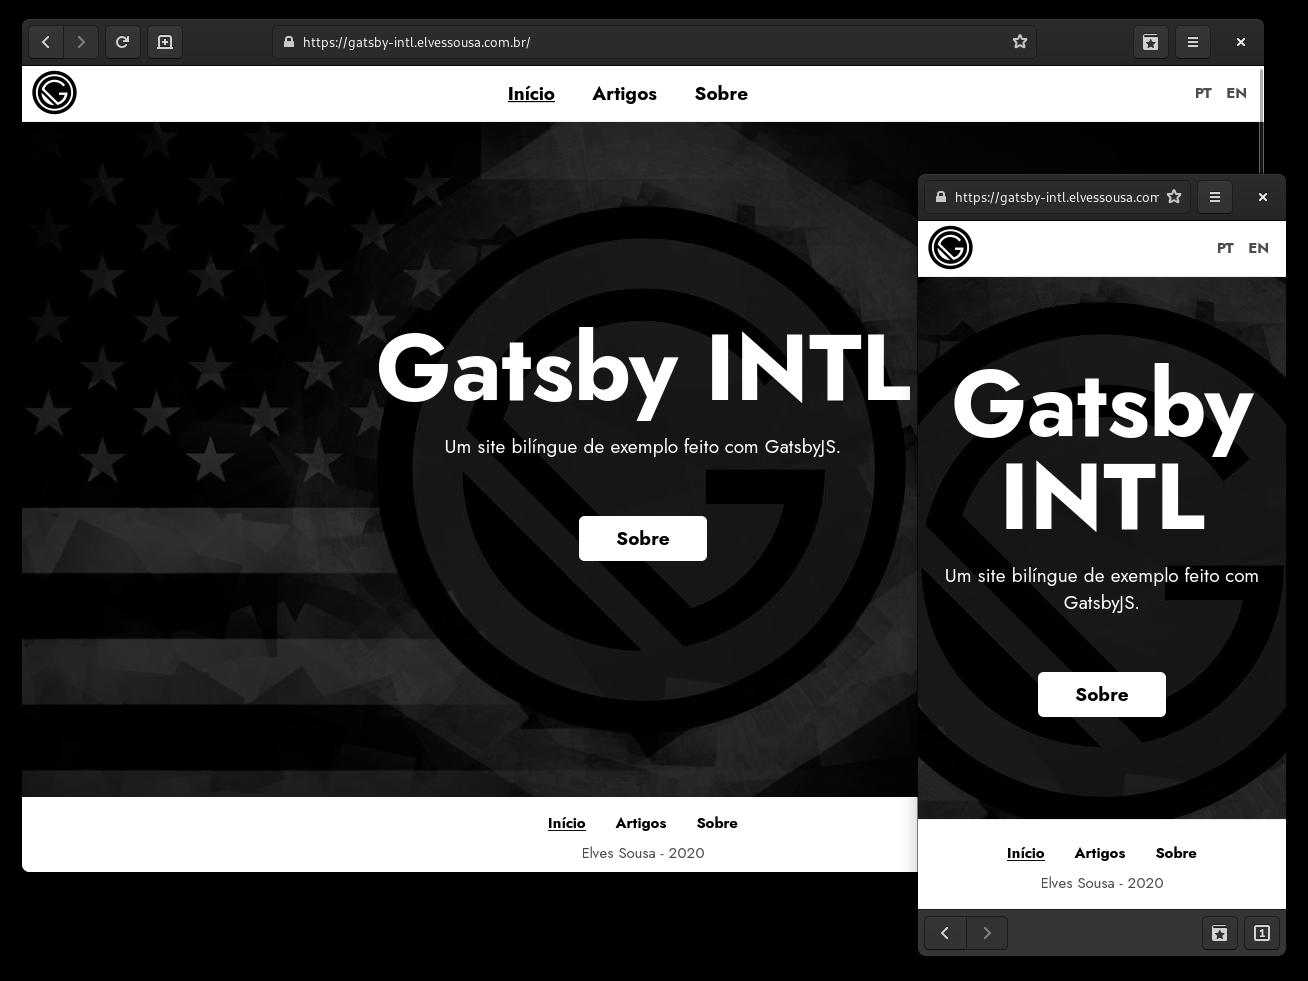 Gatsby INTL